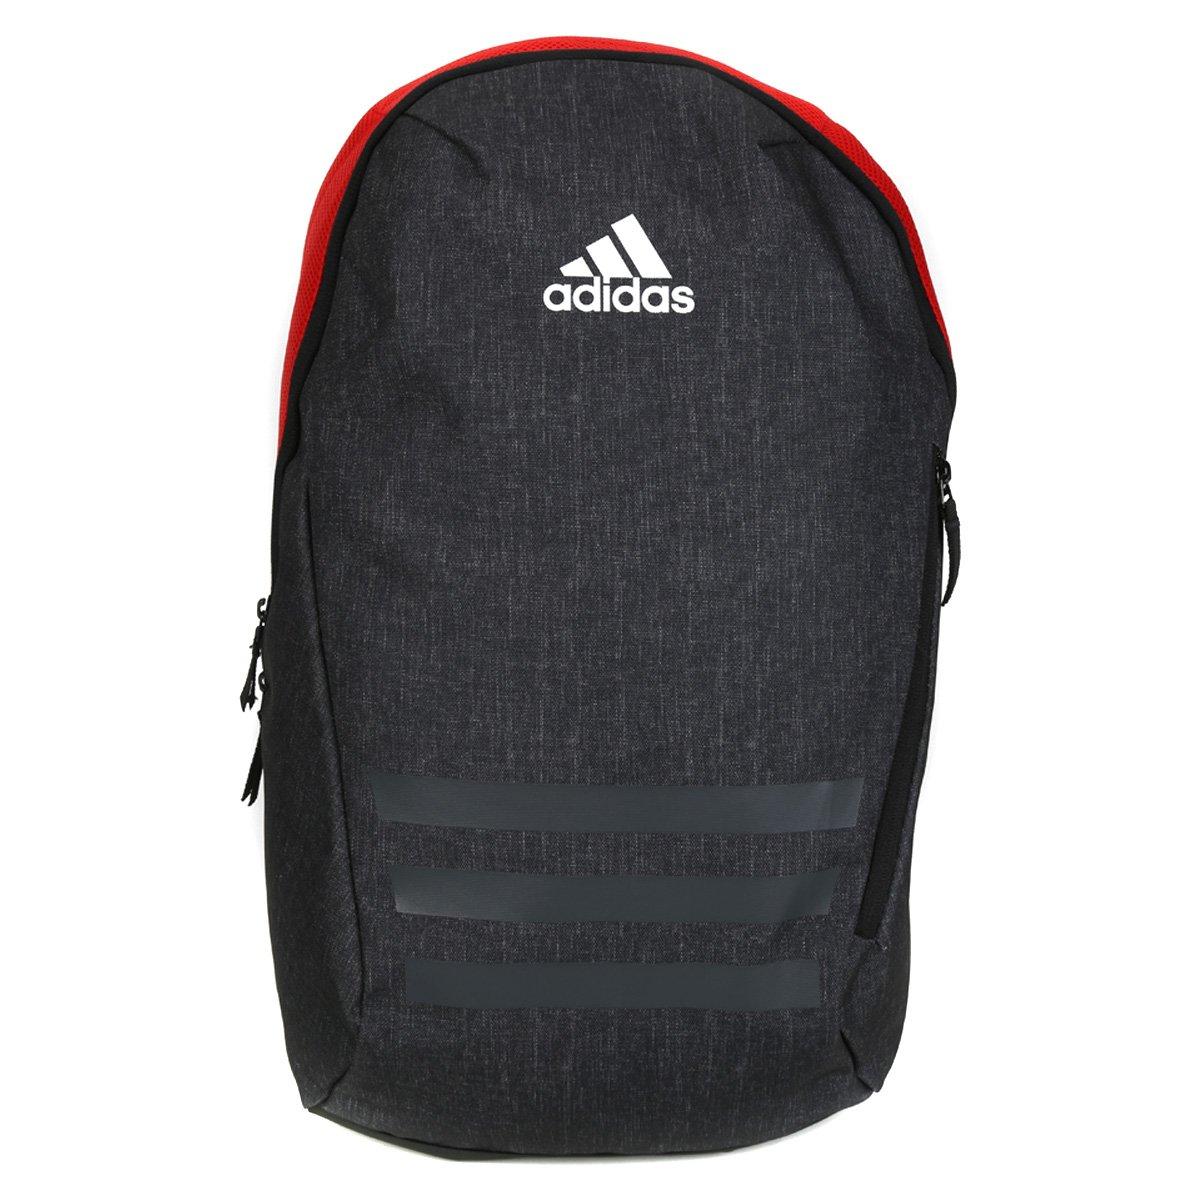 d5ebc4972 Mochila Adidas Ace | Netshoes